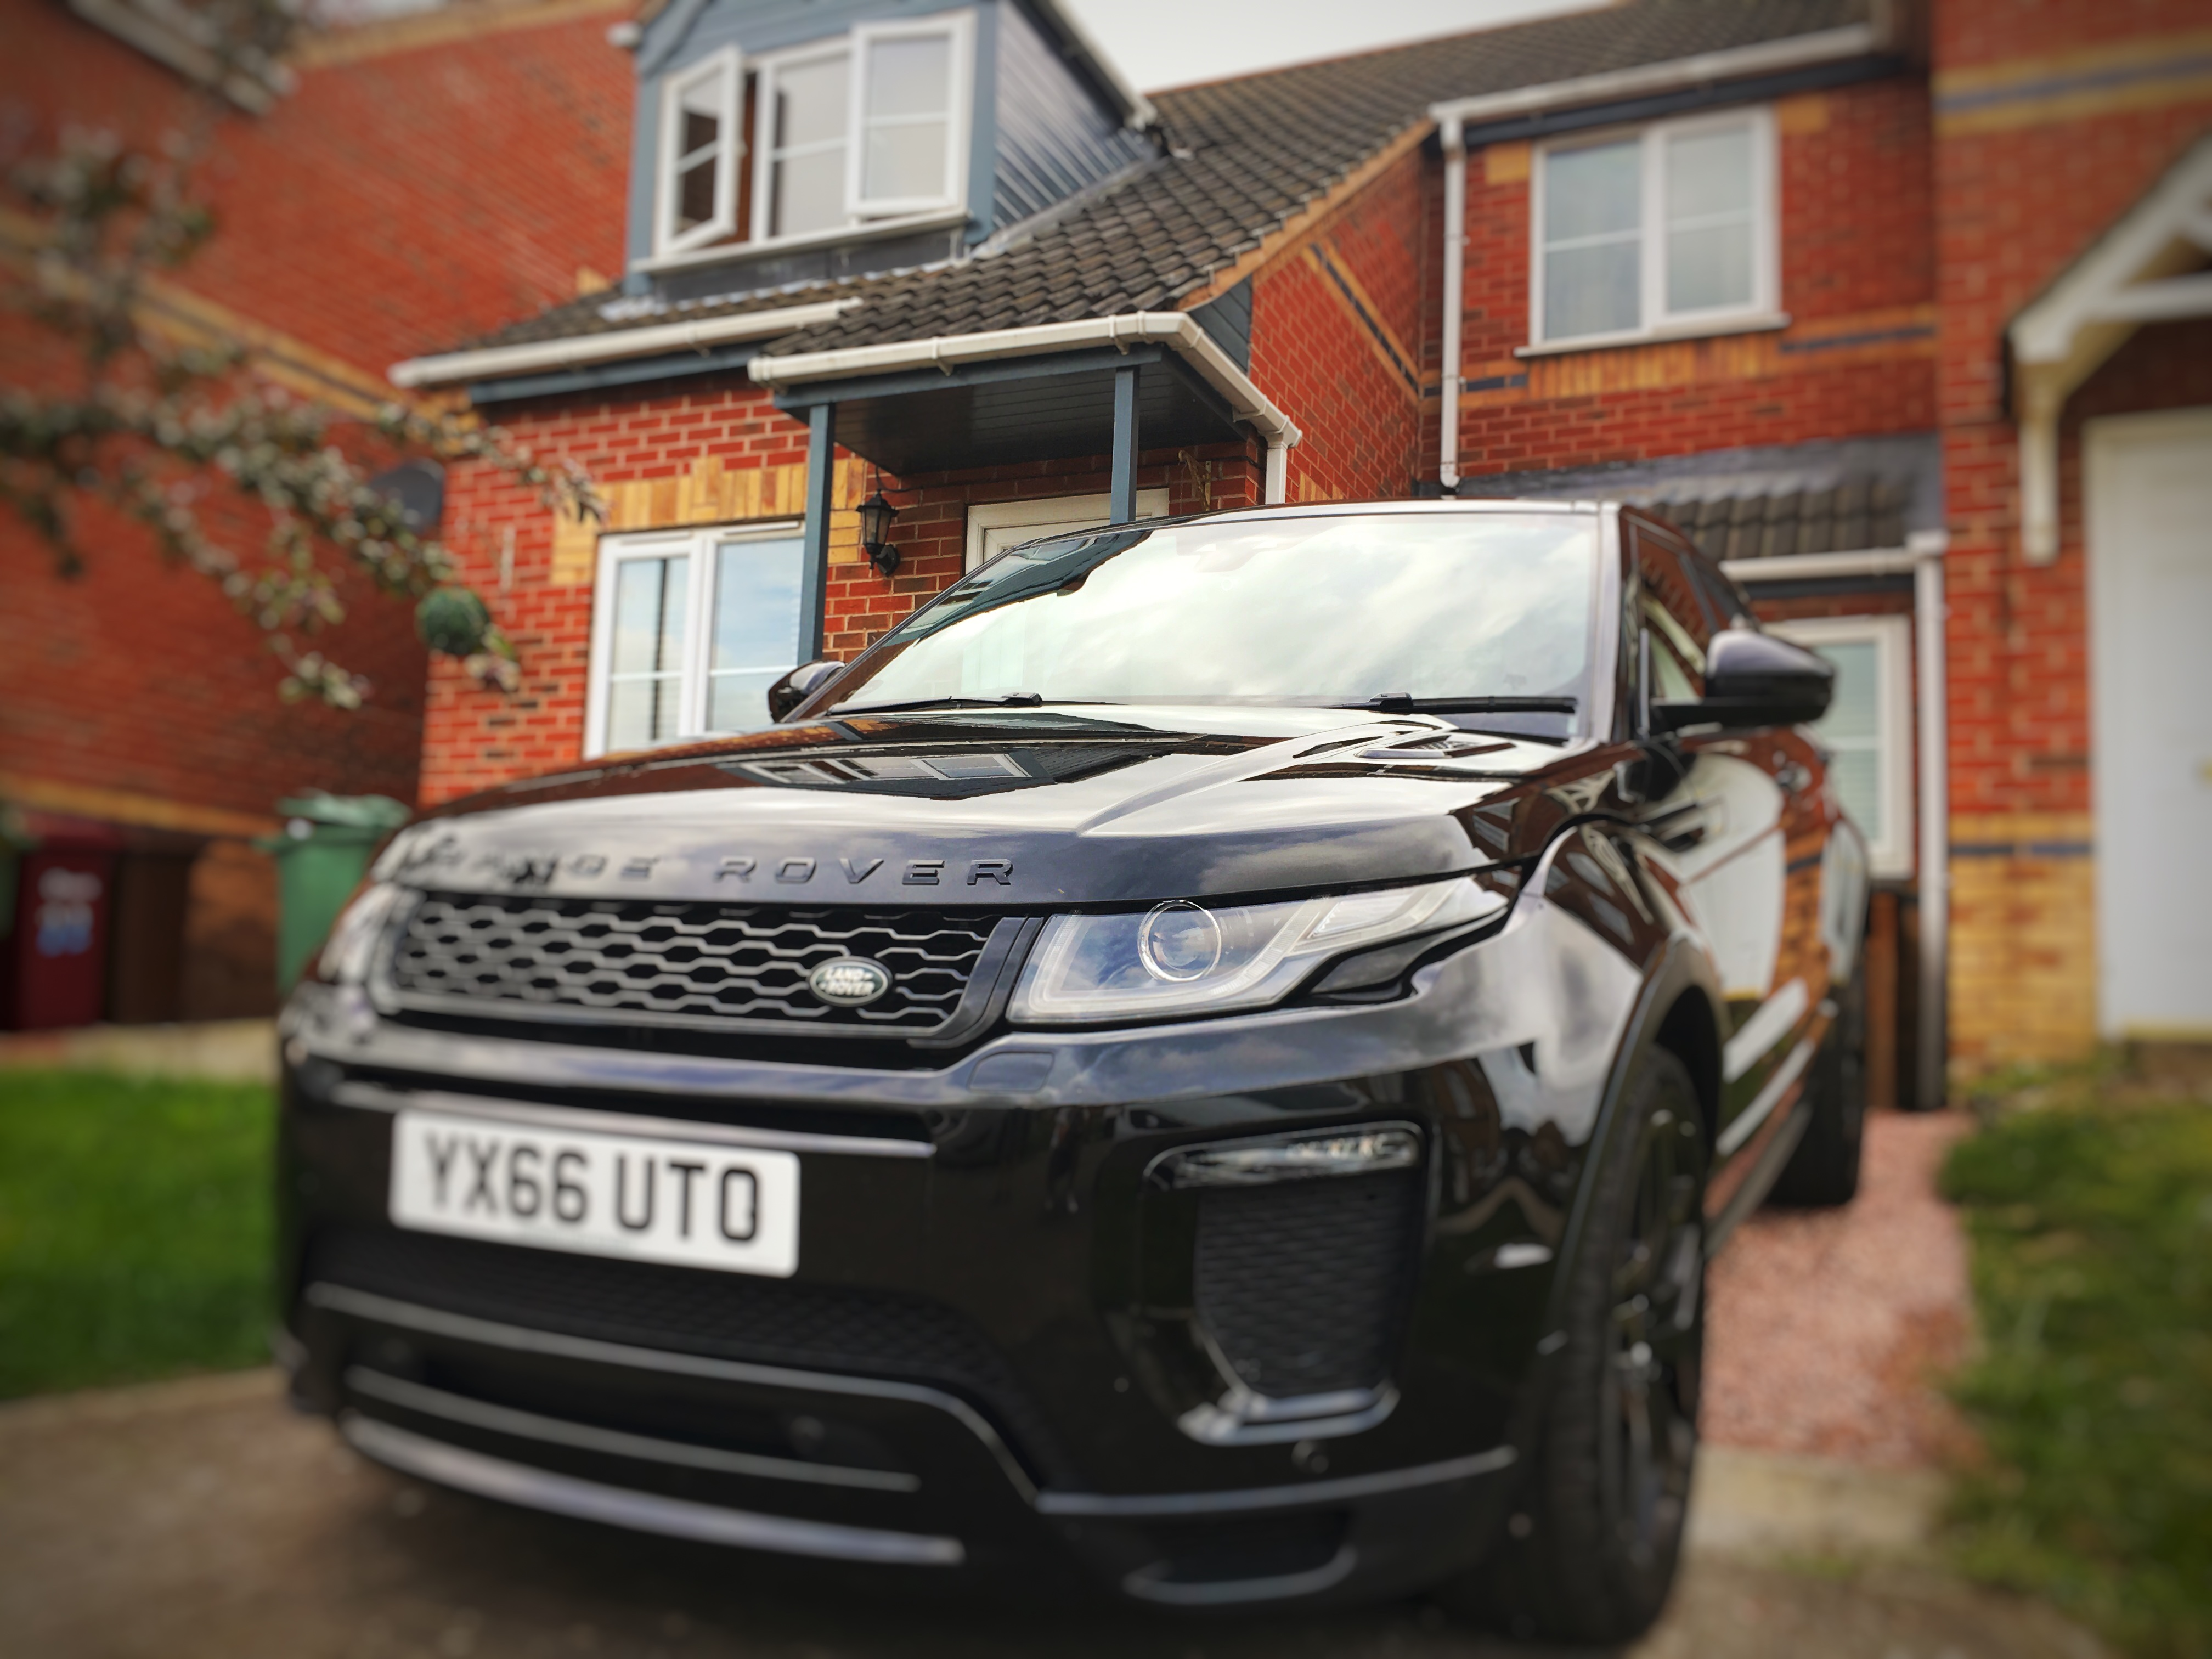 Range Rover Evoque Goluk T1 Dashcam install Lincolnshire